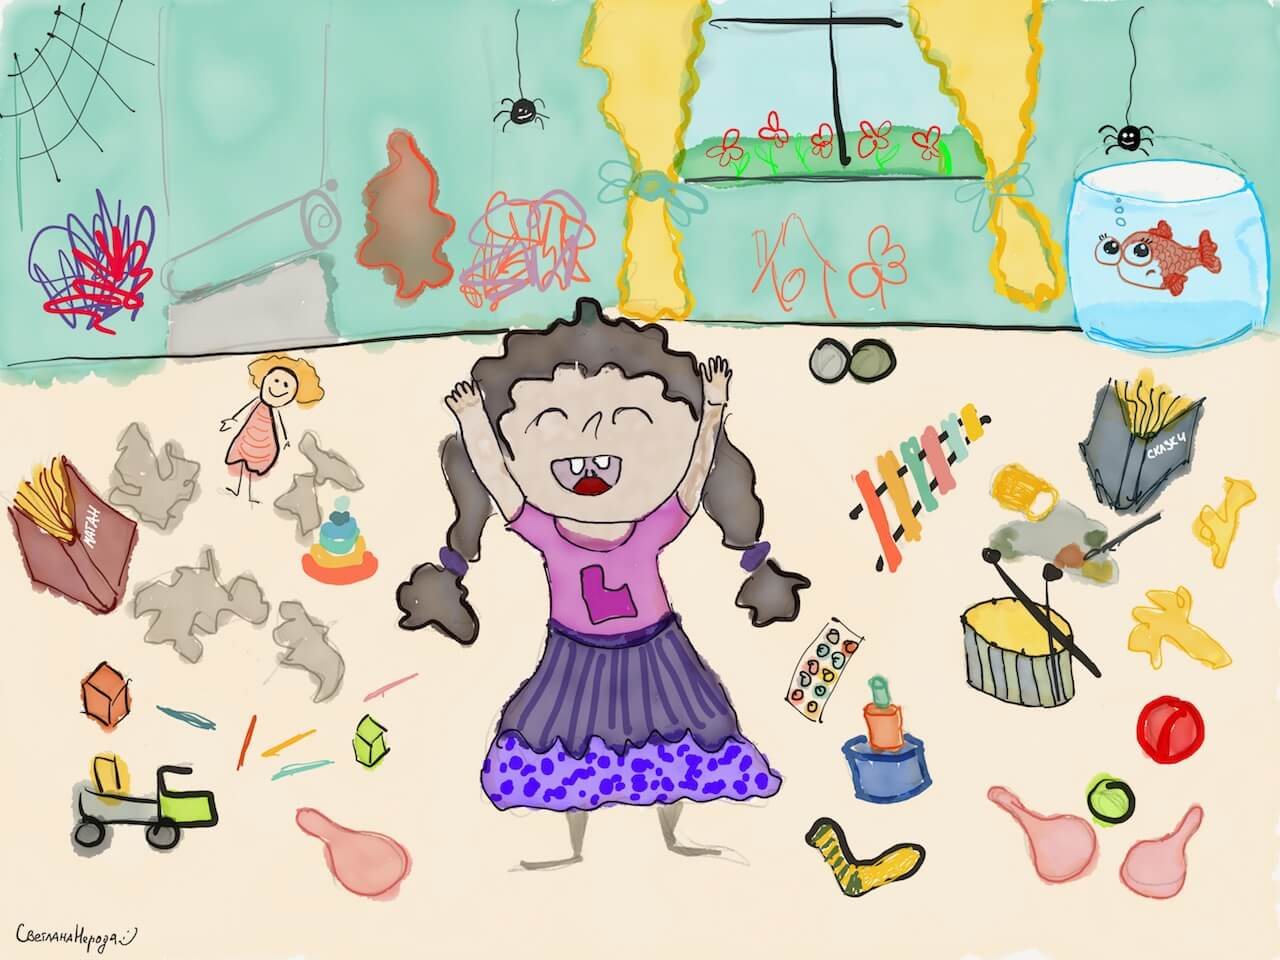 Психология в игрушках: инициатива и игрушка-пердушка